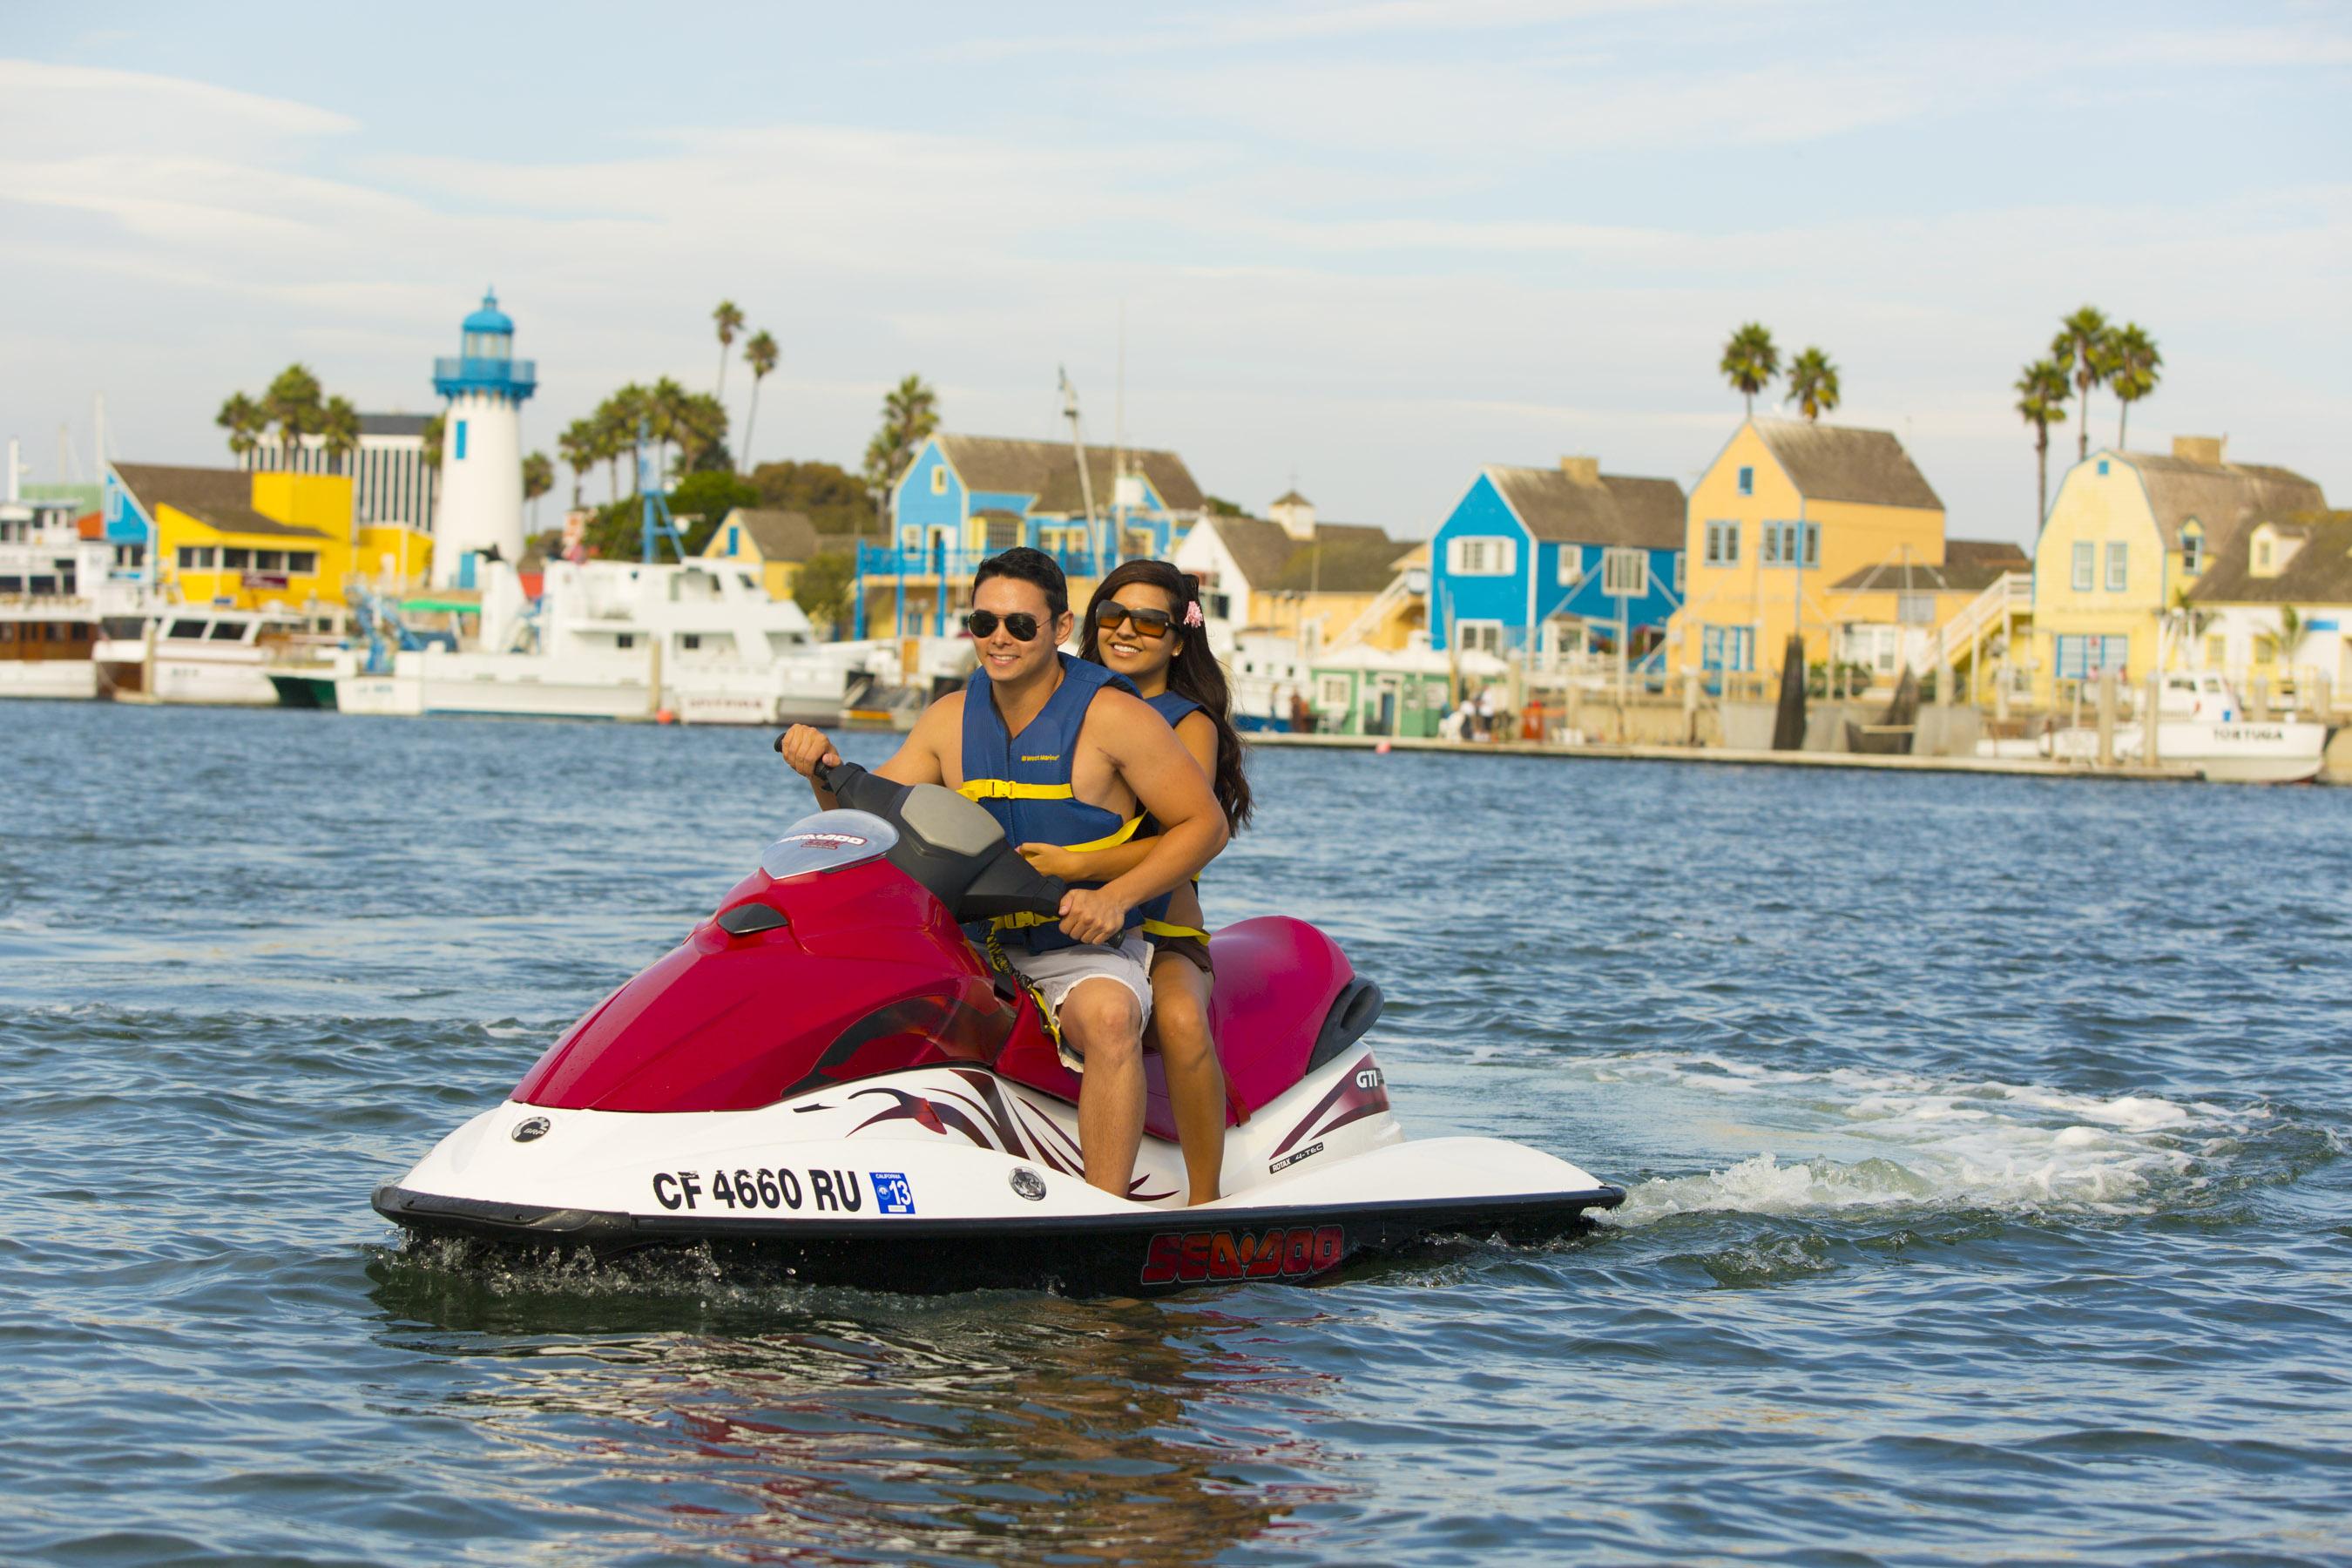 Marina Del Rey S Latest Economic Study Shows 73 Percent Growth In Photo Of Miami Beach Jet Ski